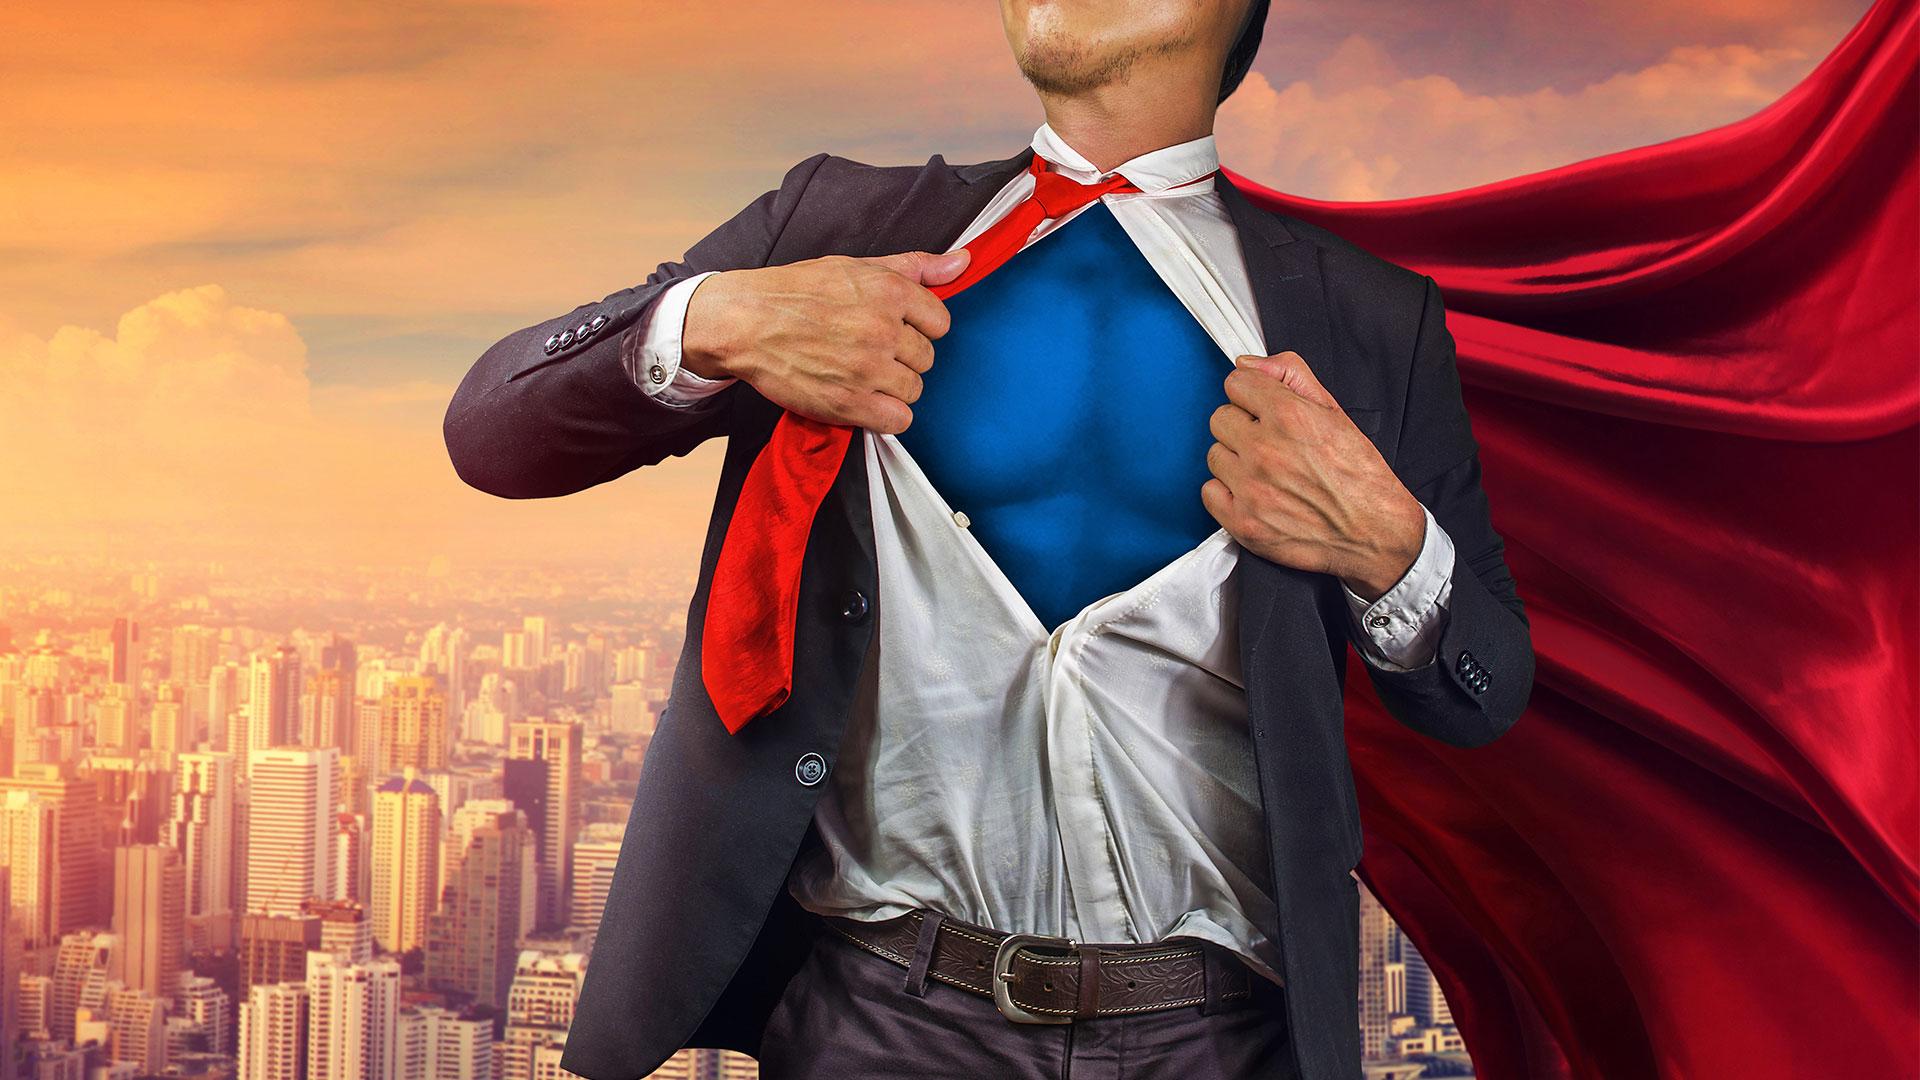 superhero-featured